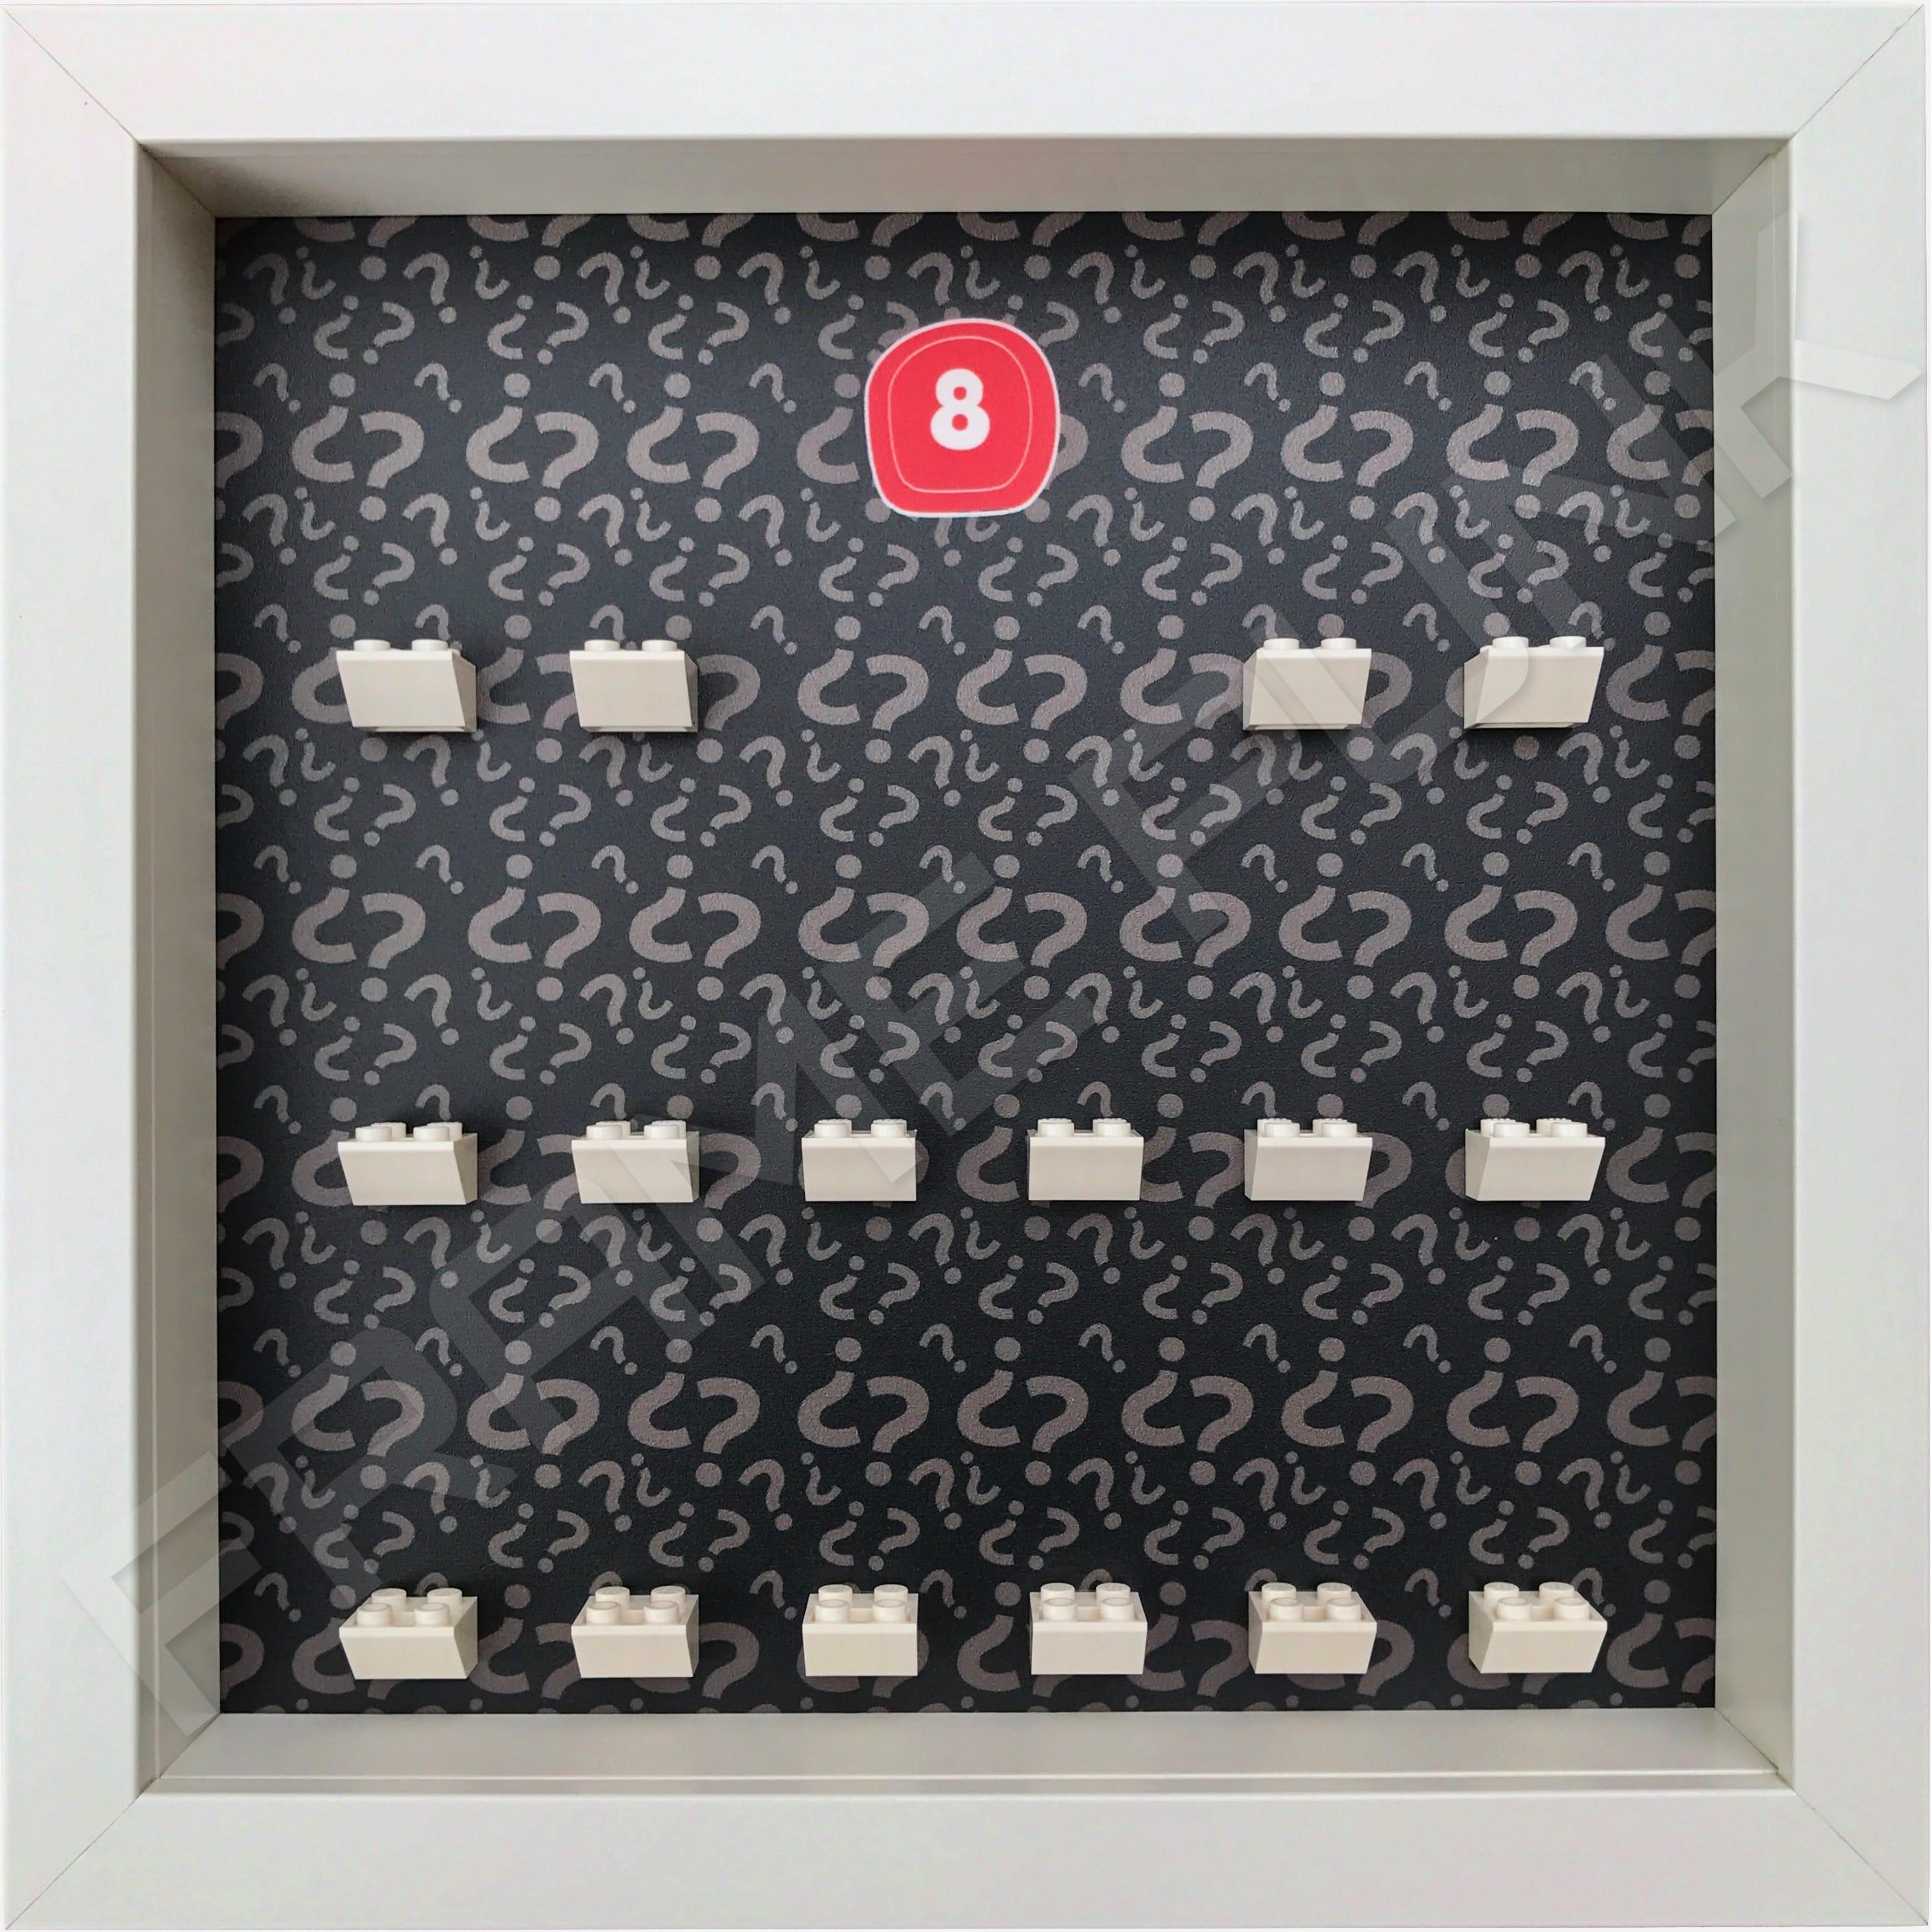 Lego minifigures series 8 display frame